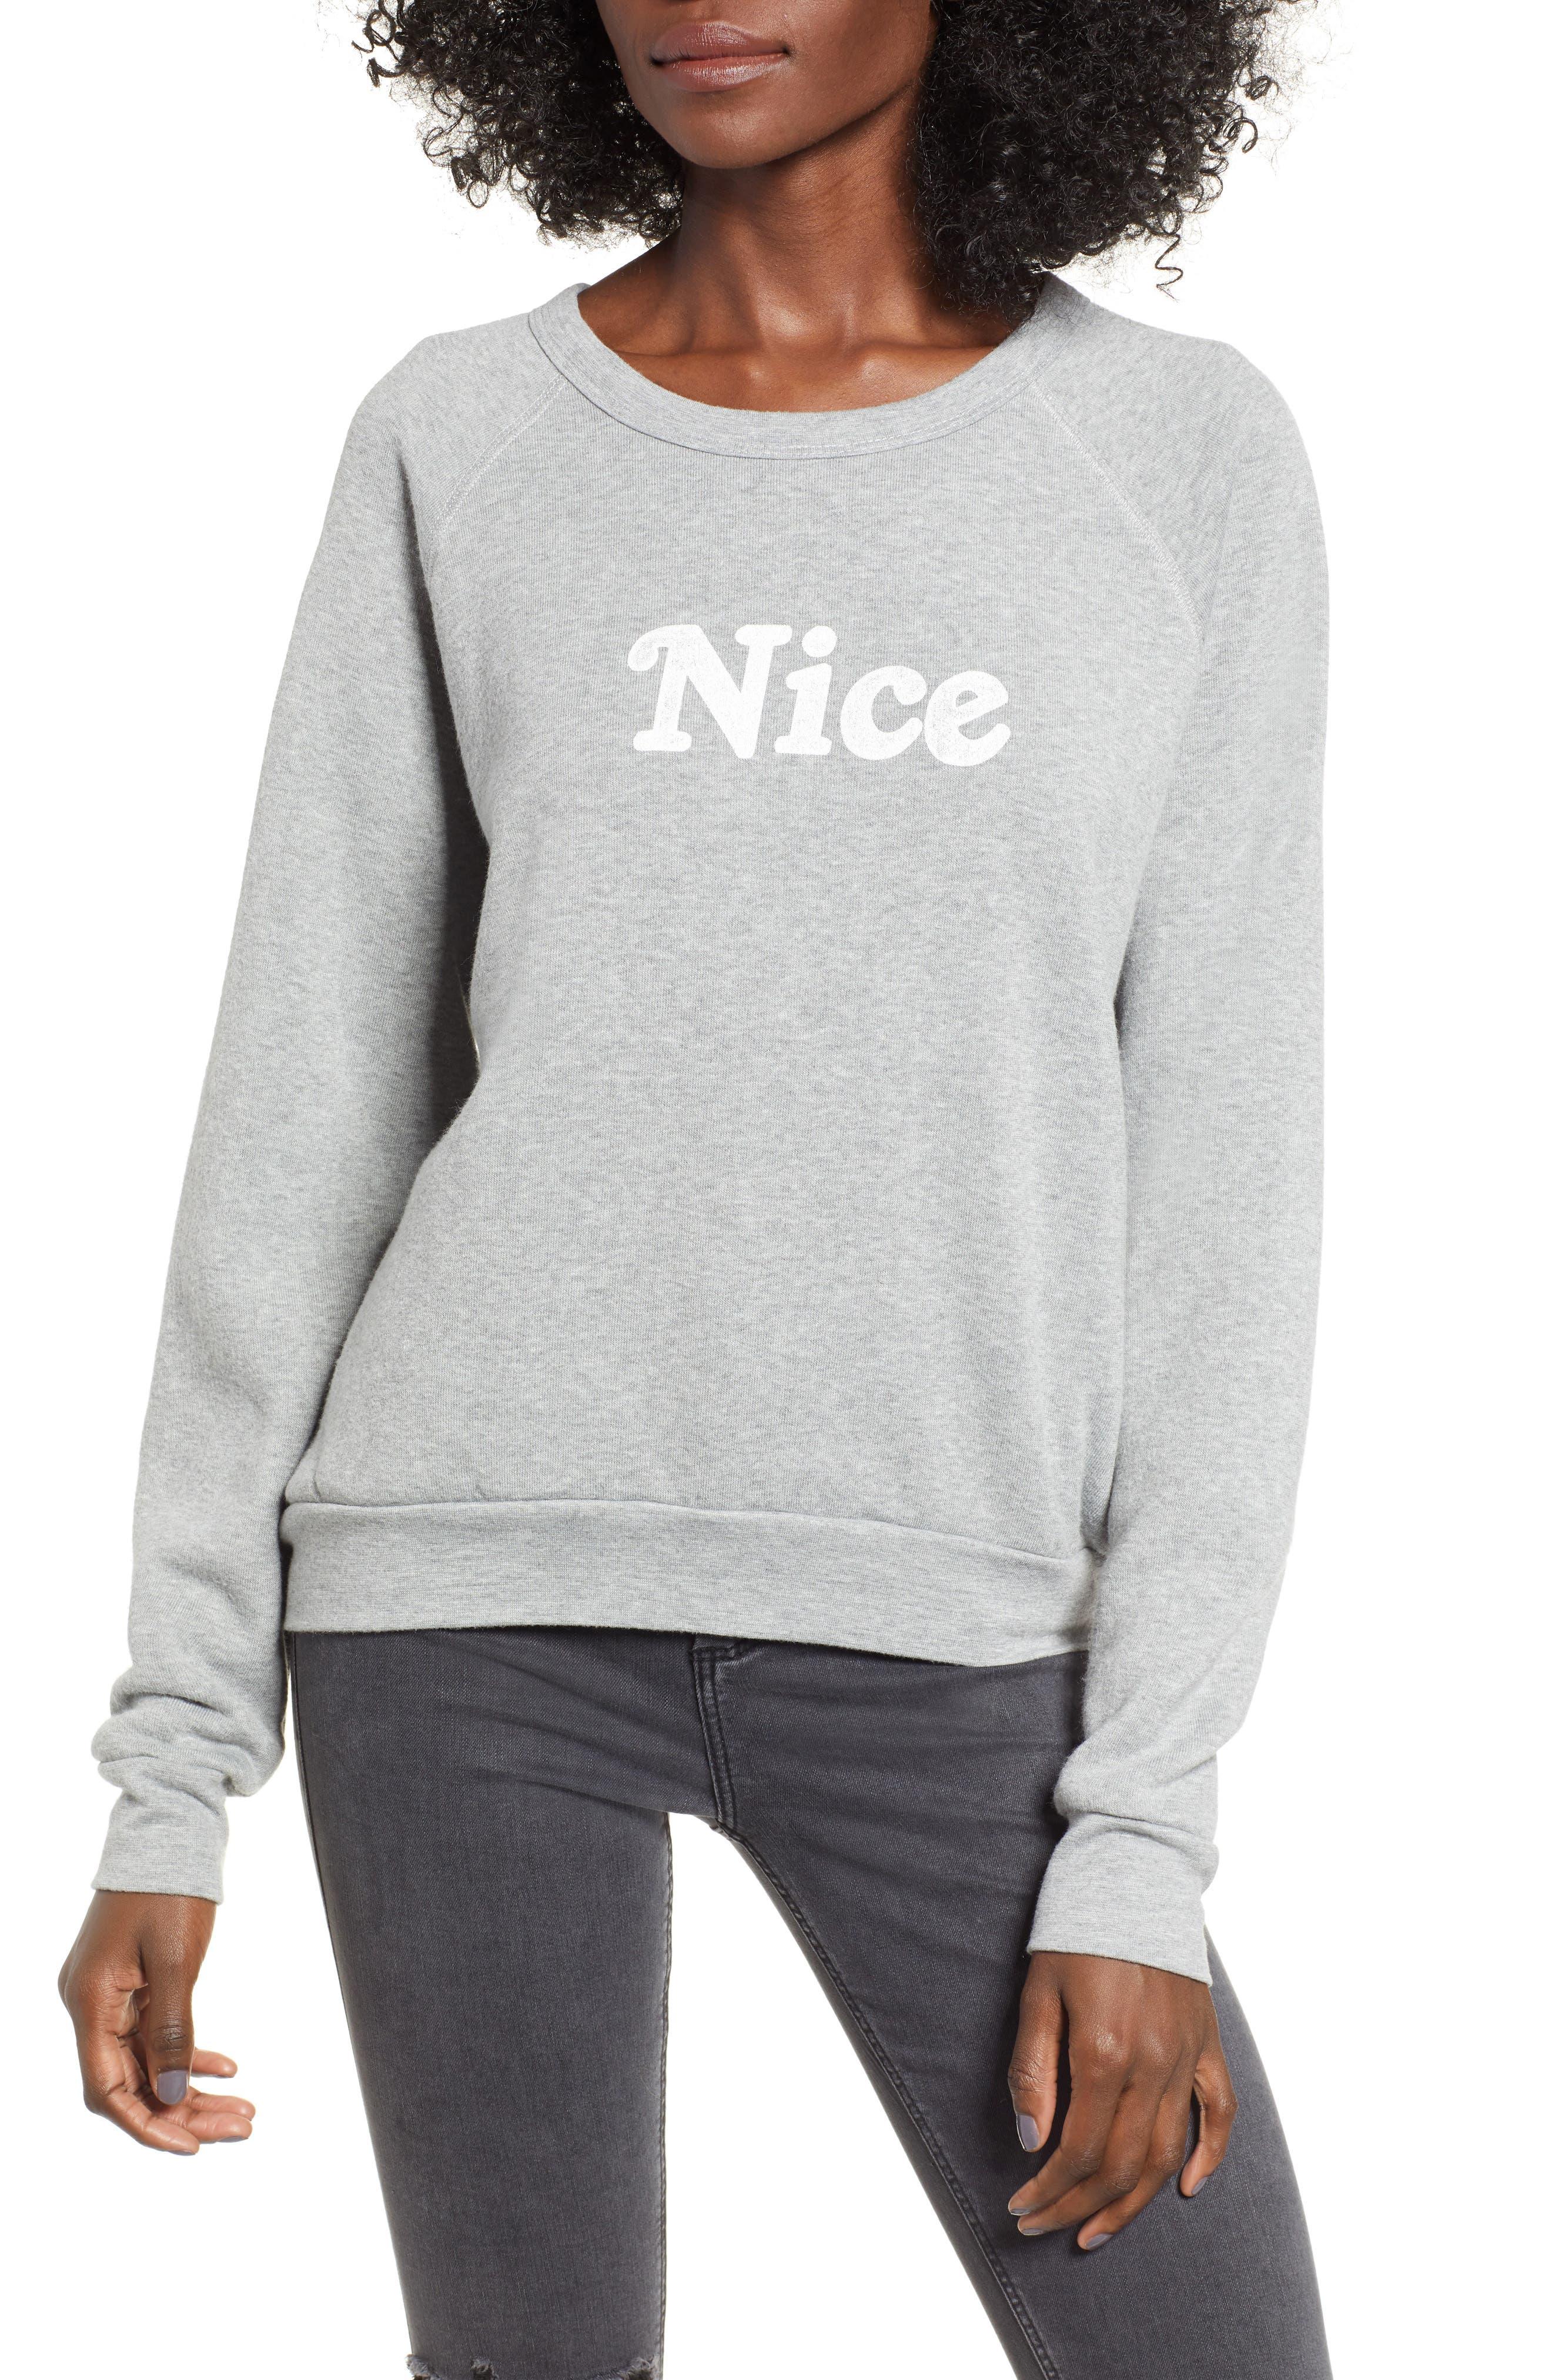 PROJECT SOCIAL T Naughty/Nice Reversible Sweatshirt in Heather Grey